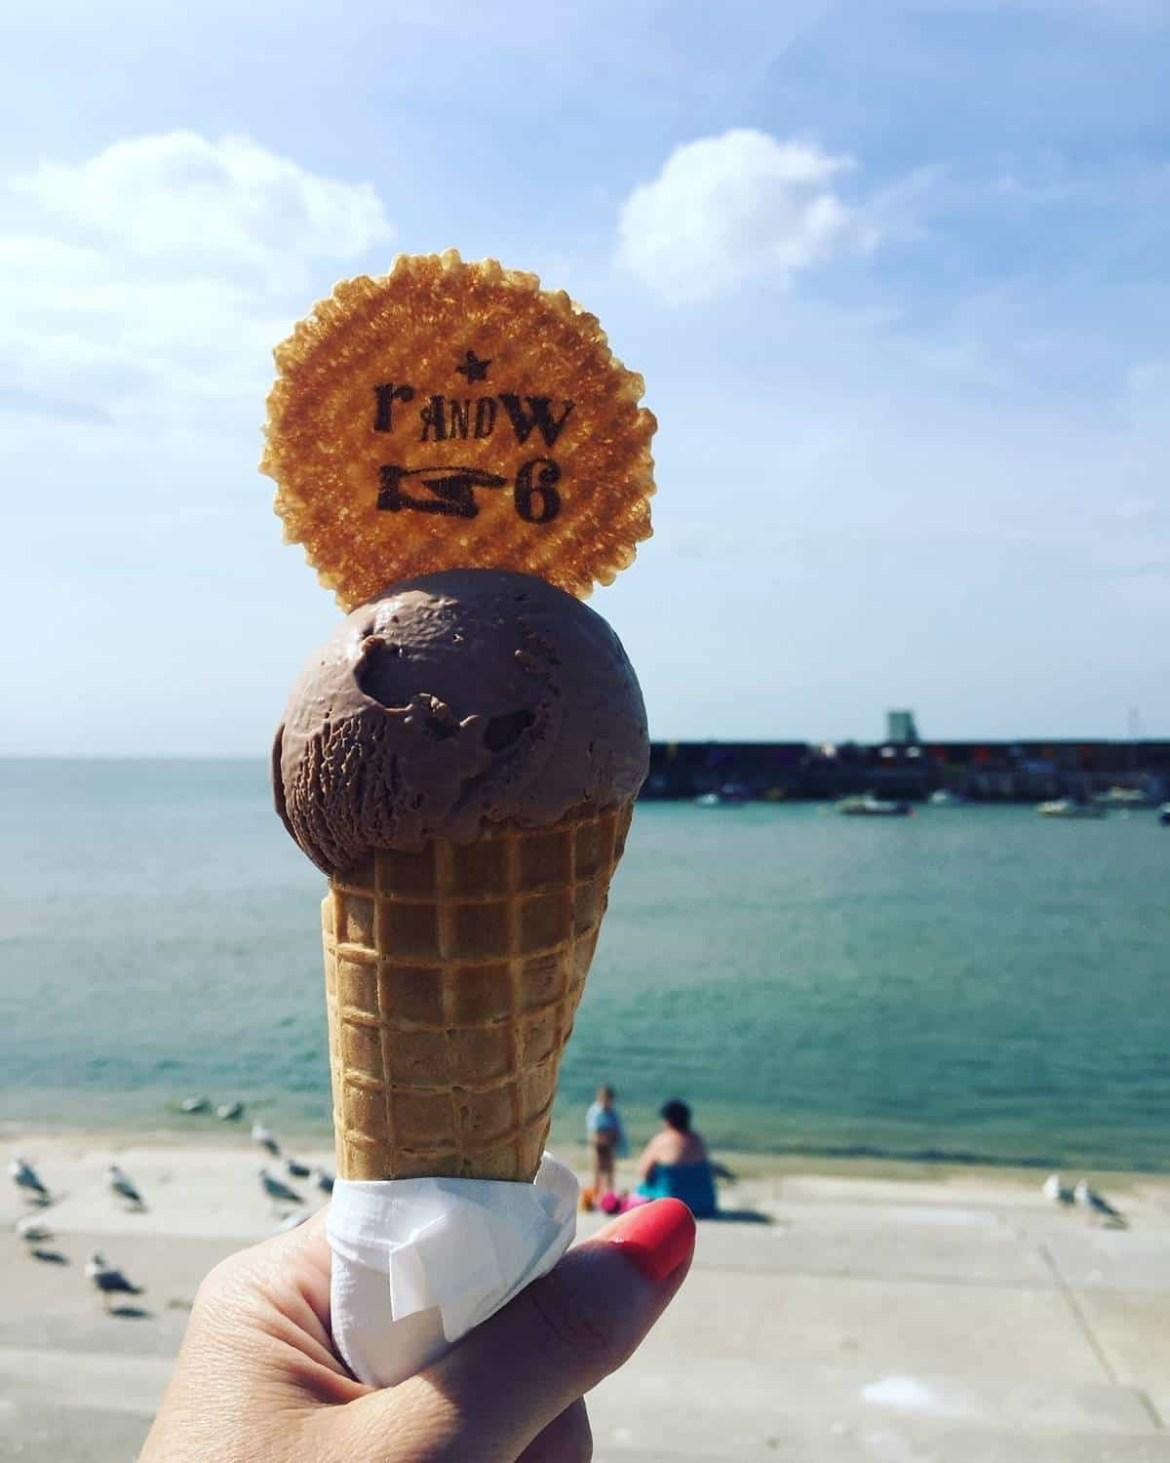 Ice-cream on the beach in Margate